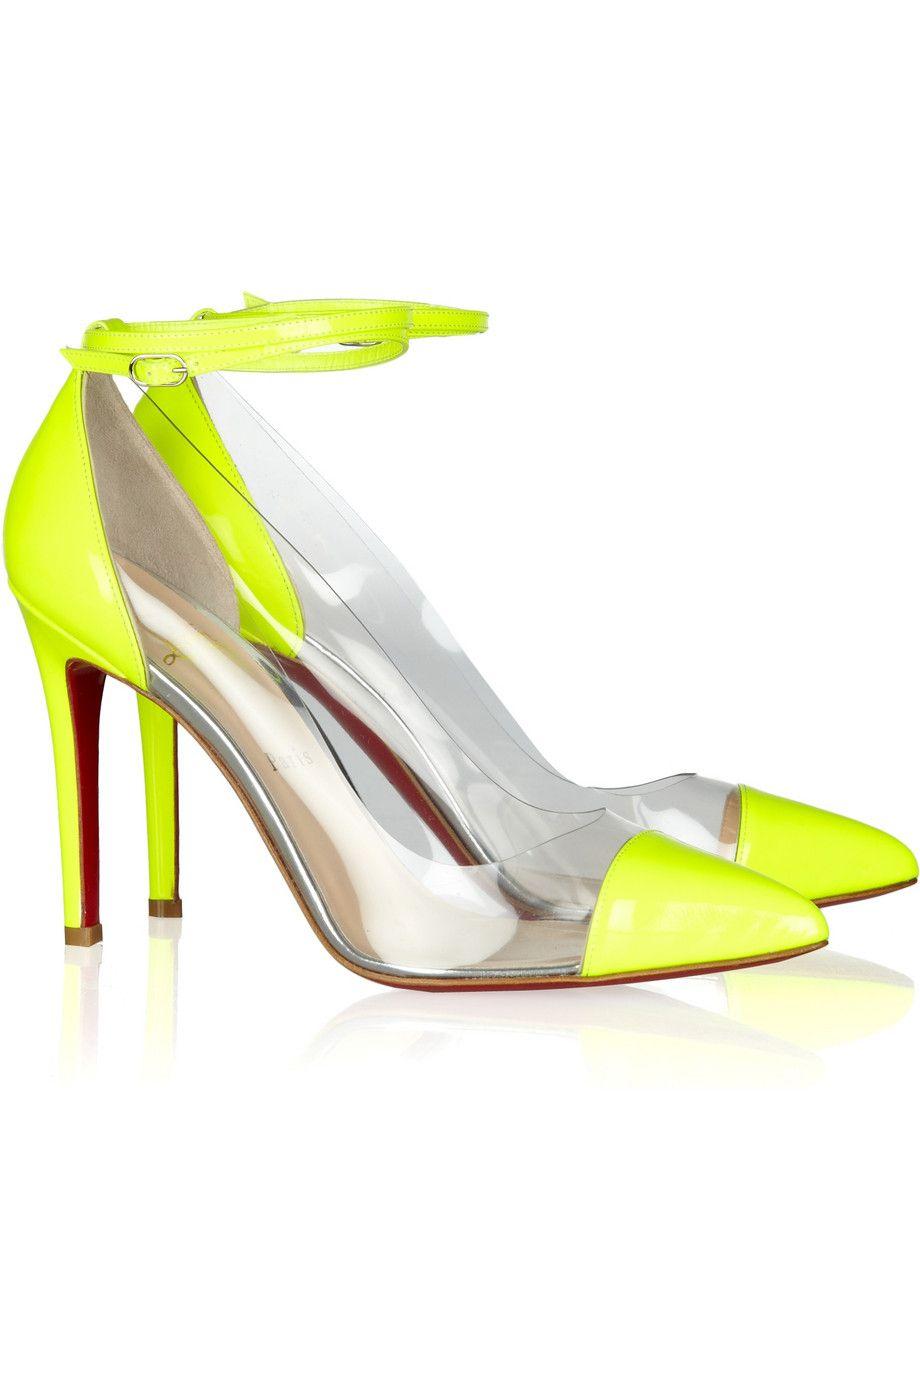 christian louboutin neon yellow patent pumps